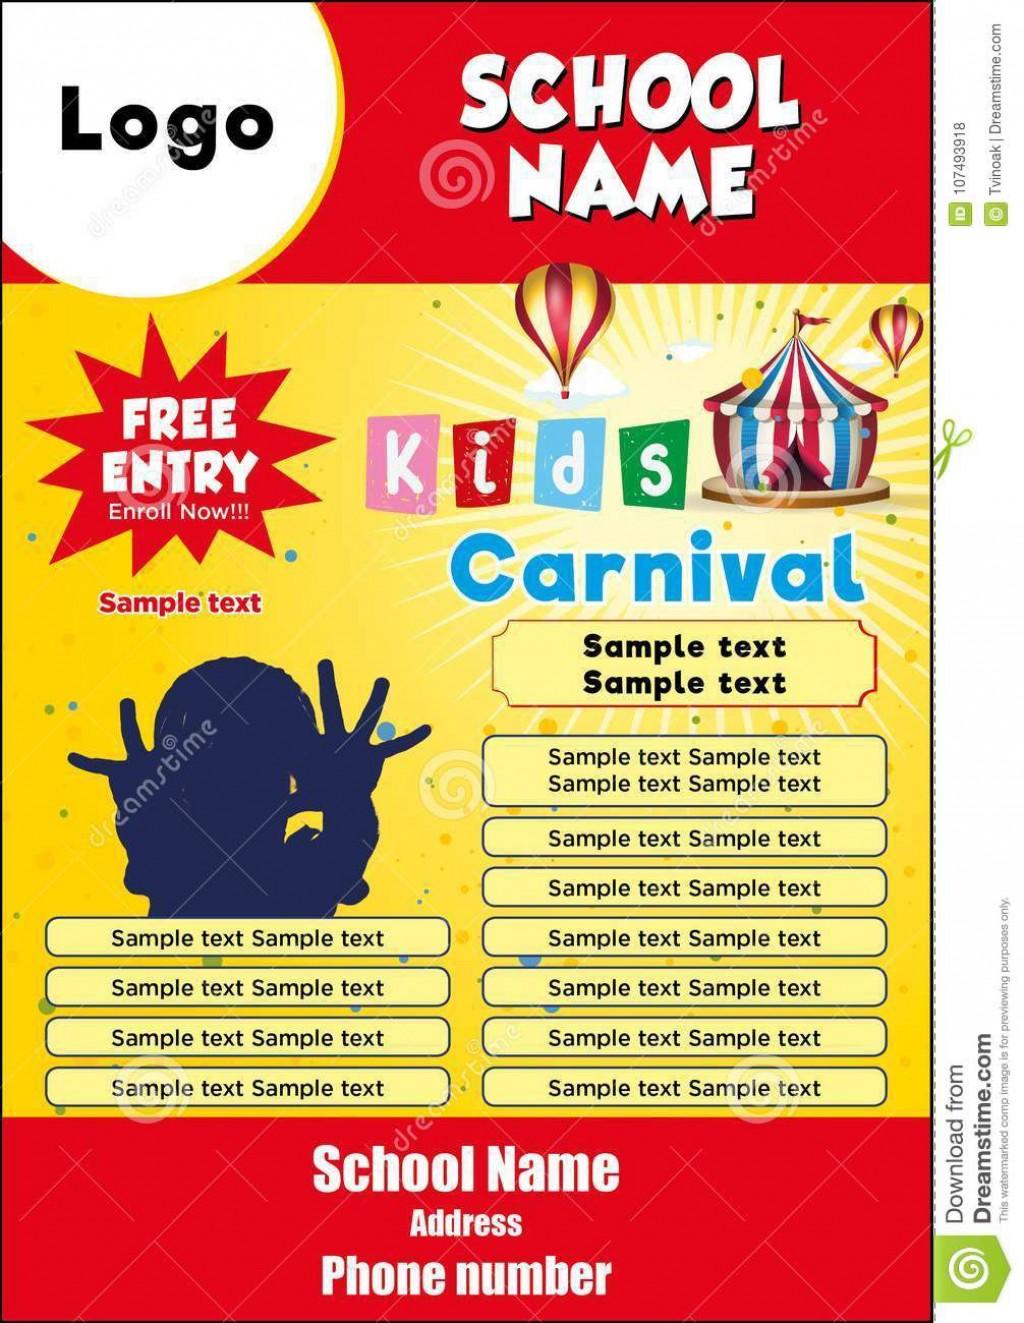 008 Stirring Free School Carnival Flyer Template Sample  Templates DownloadLarge